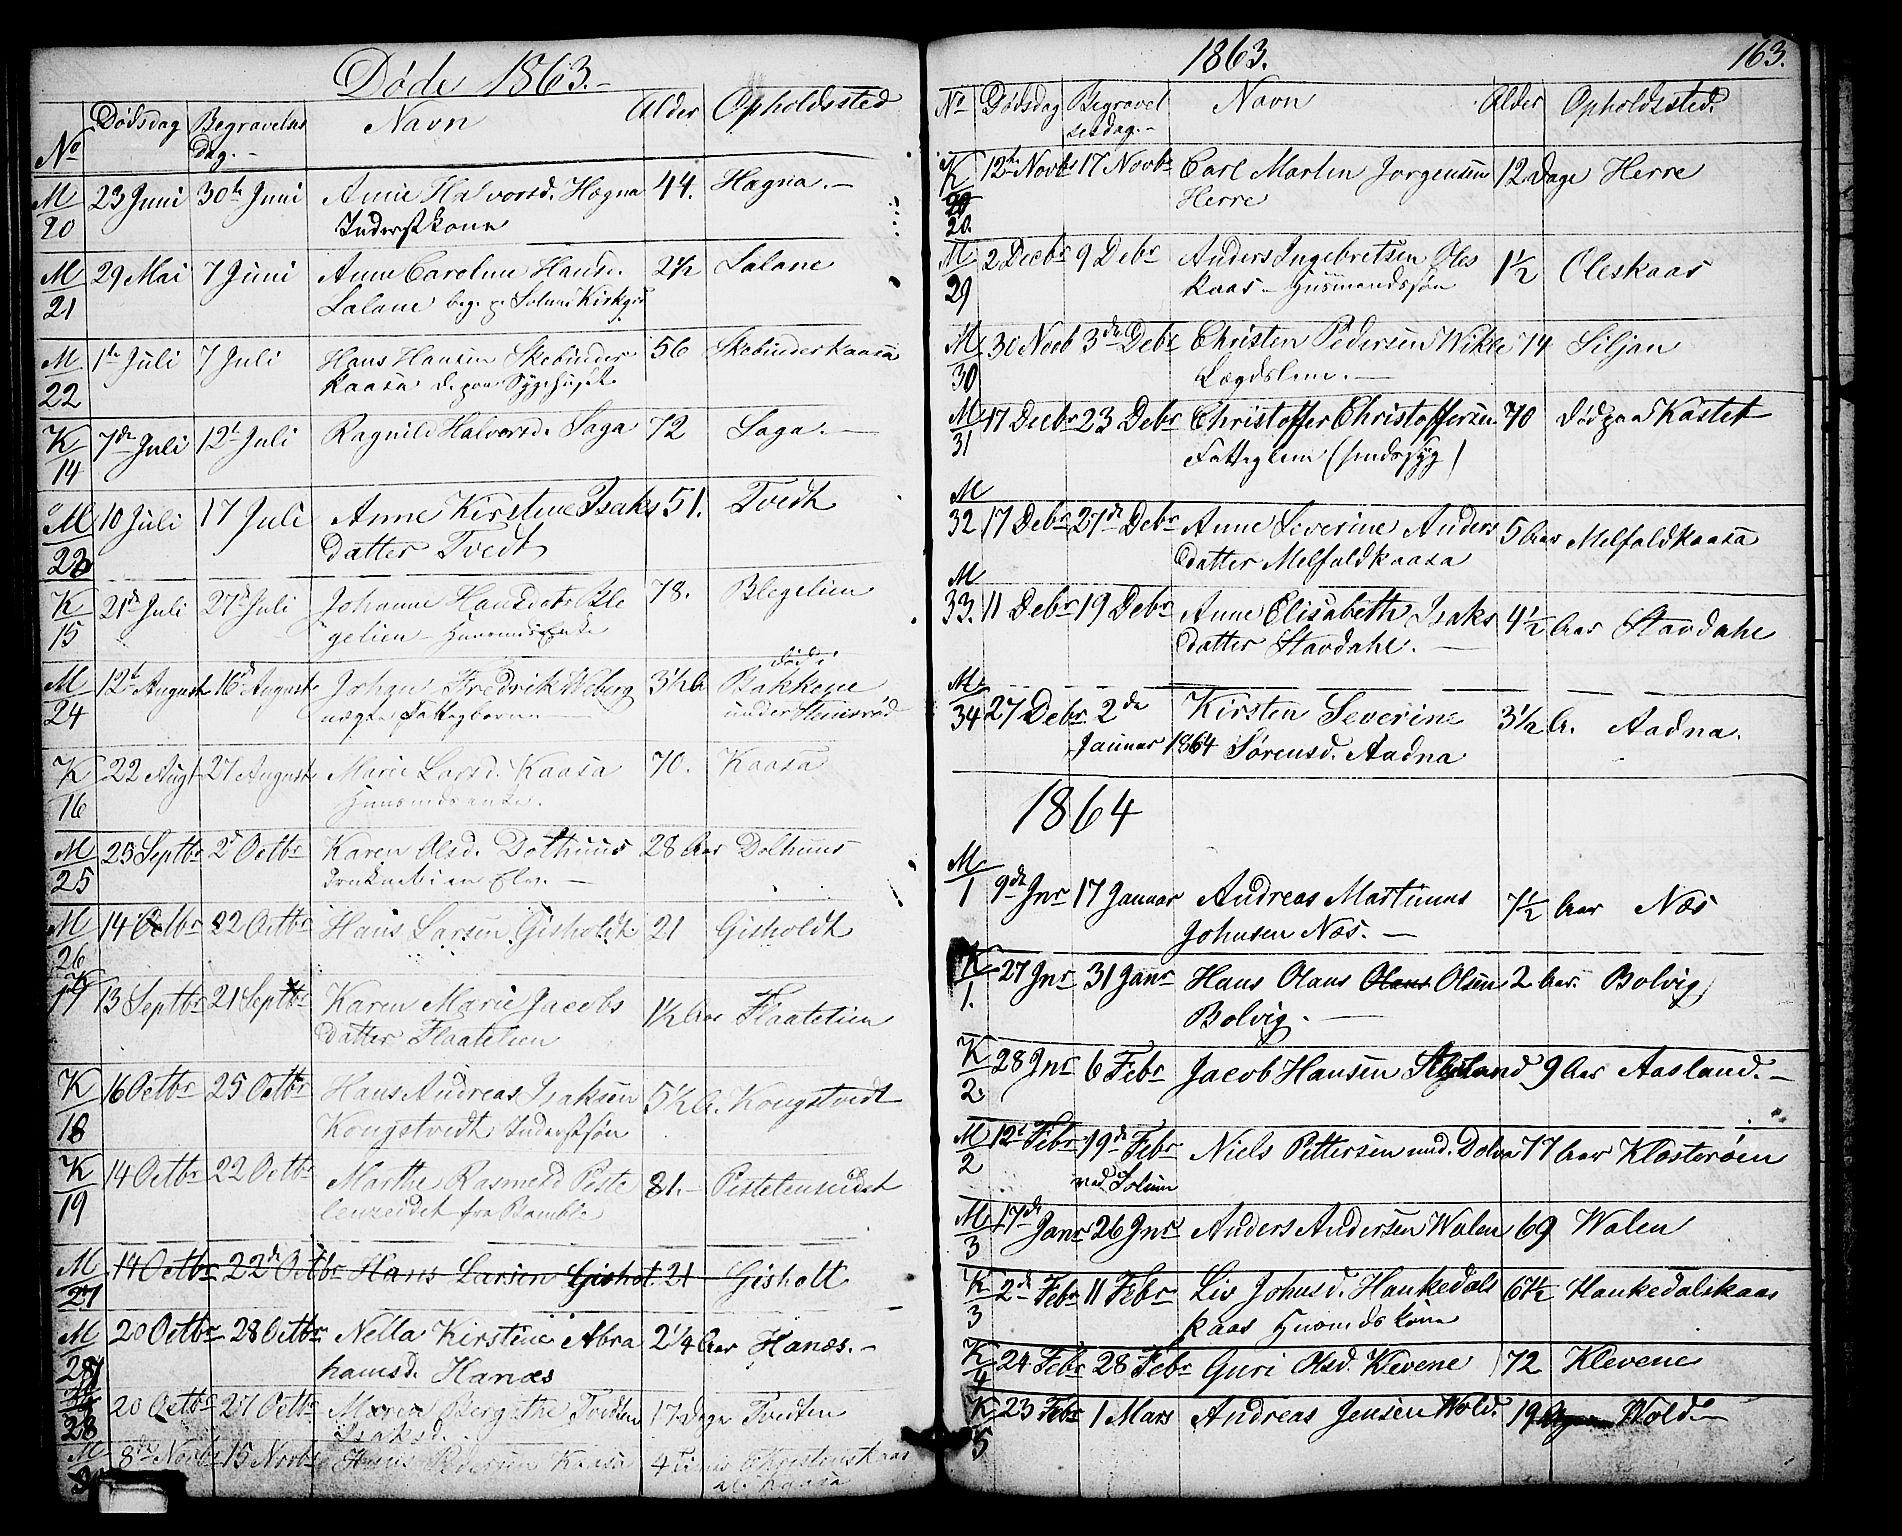 SAKO, Solum kirkebøker, G/Gb/L0002: Klokkerbok nr. II 2, 1859-1879, s. 163